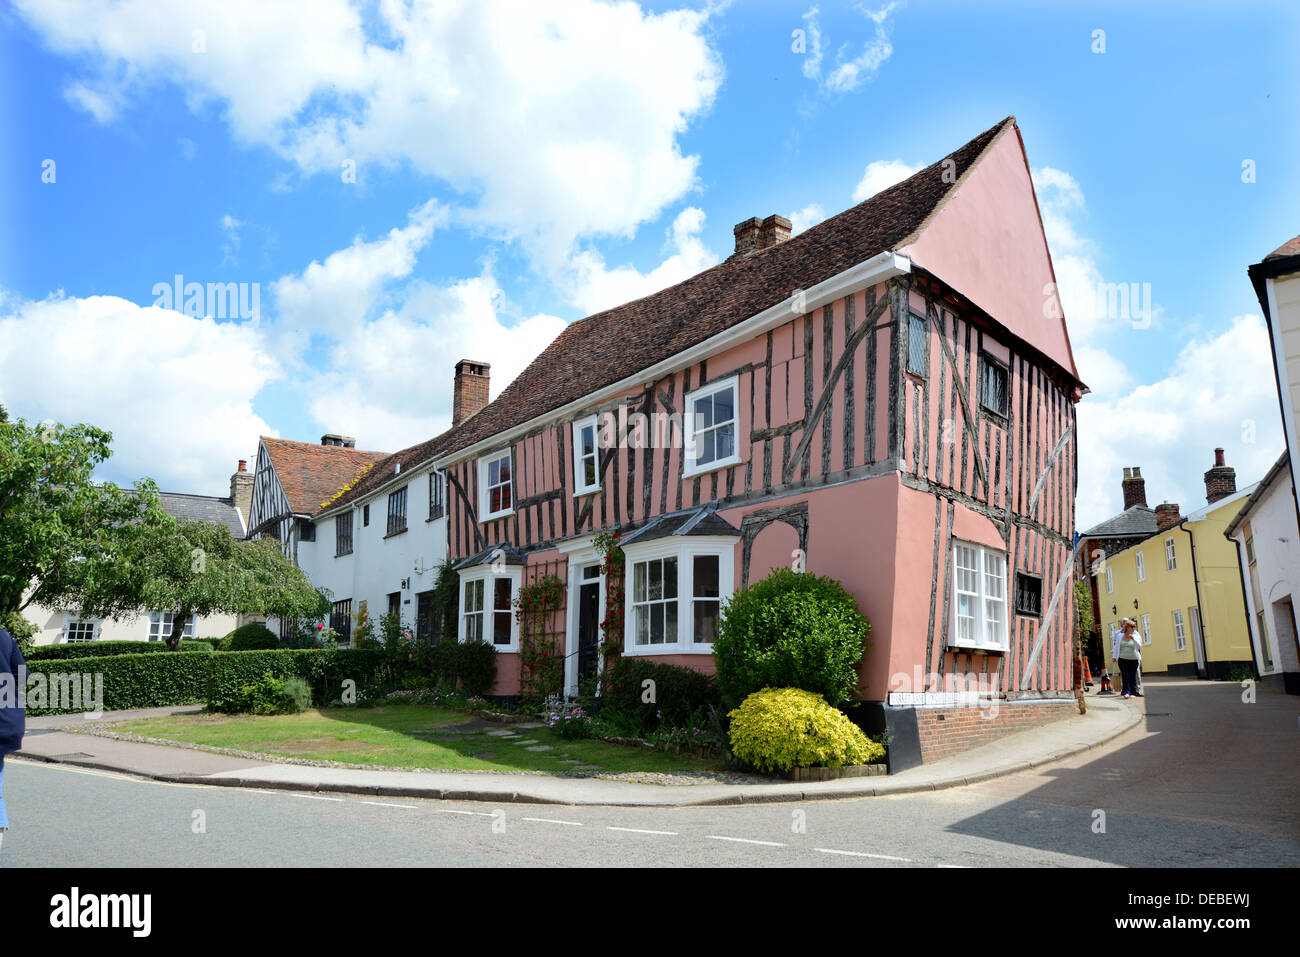 A beautiful historical corner in the Suffolk village of Lavenham - Stock Image